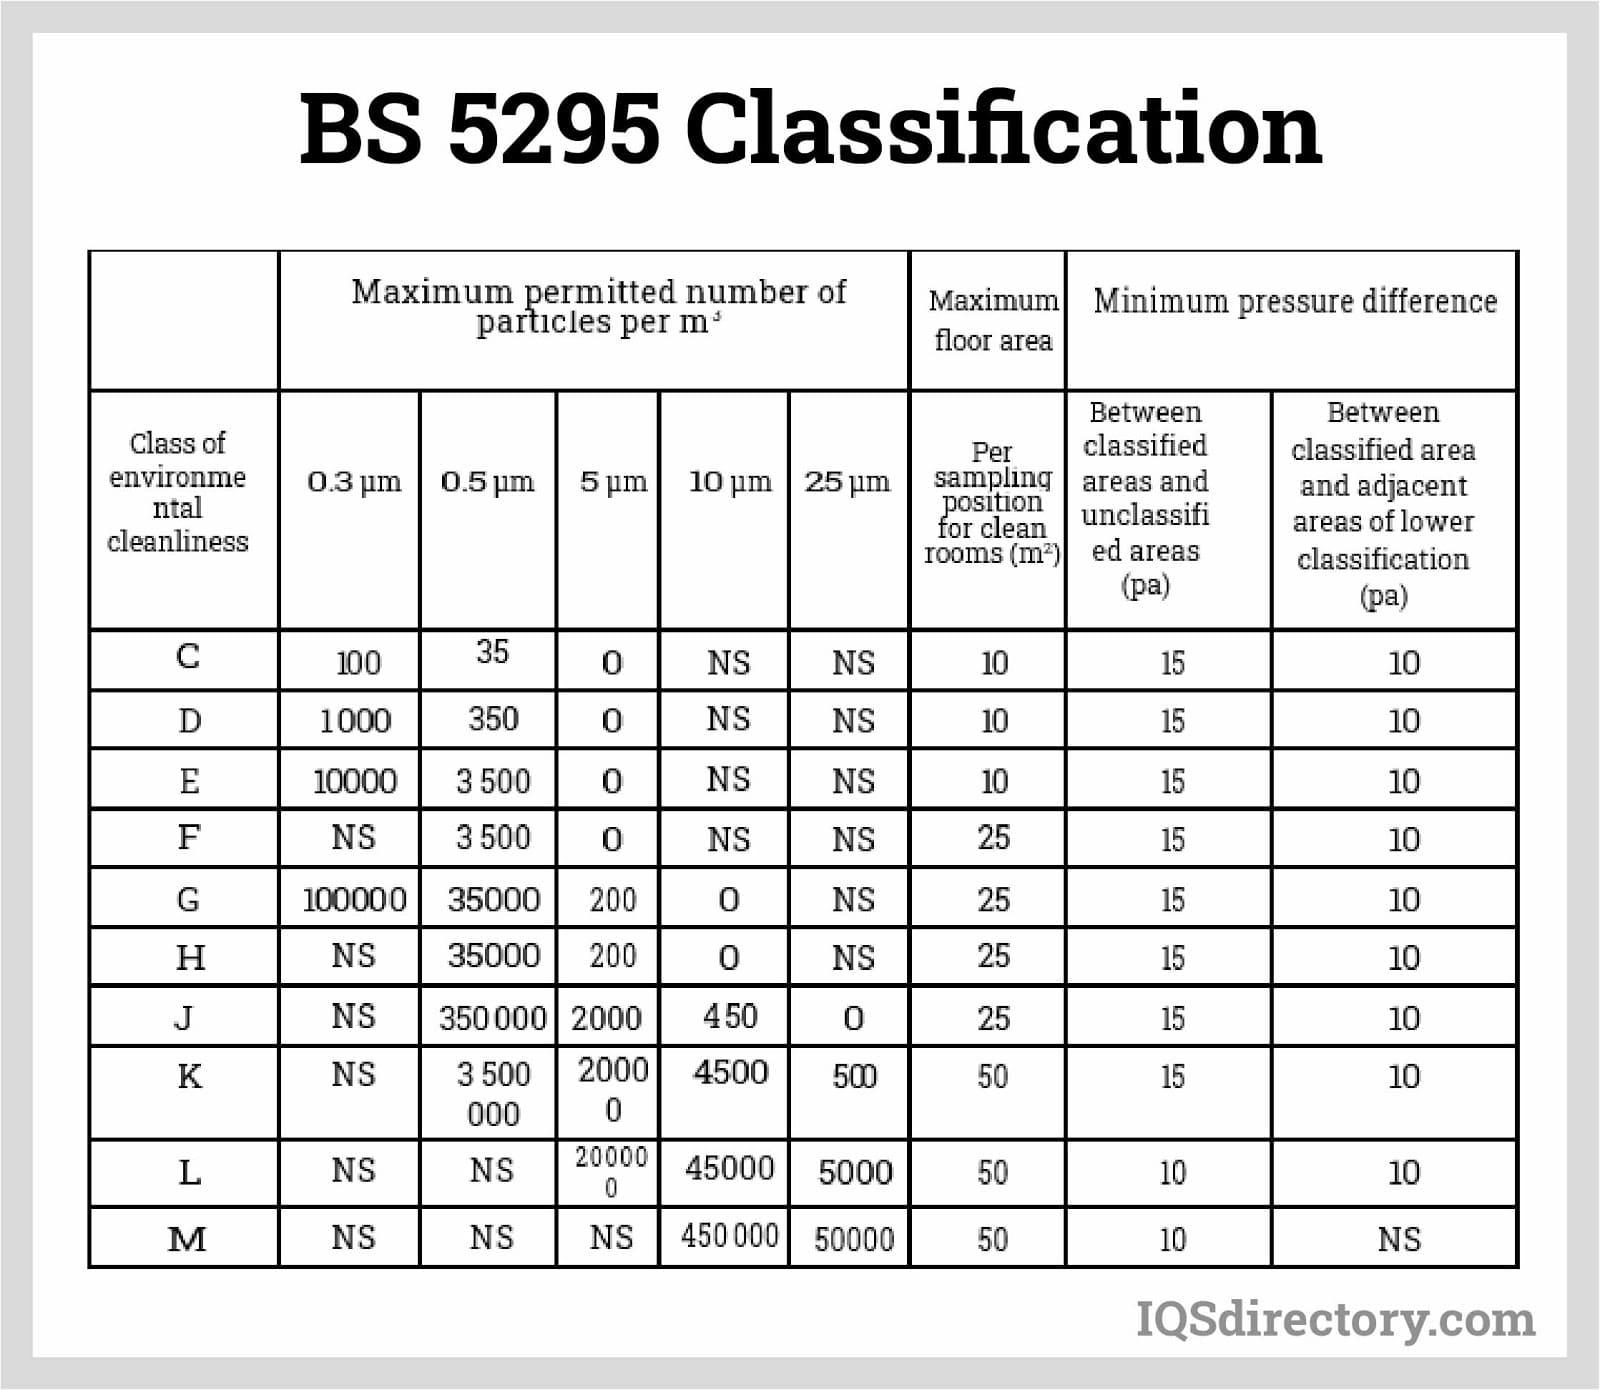 BS 5295 Classifications